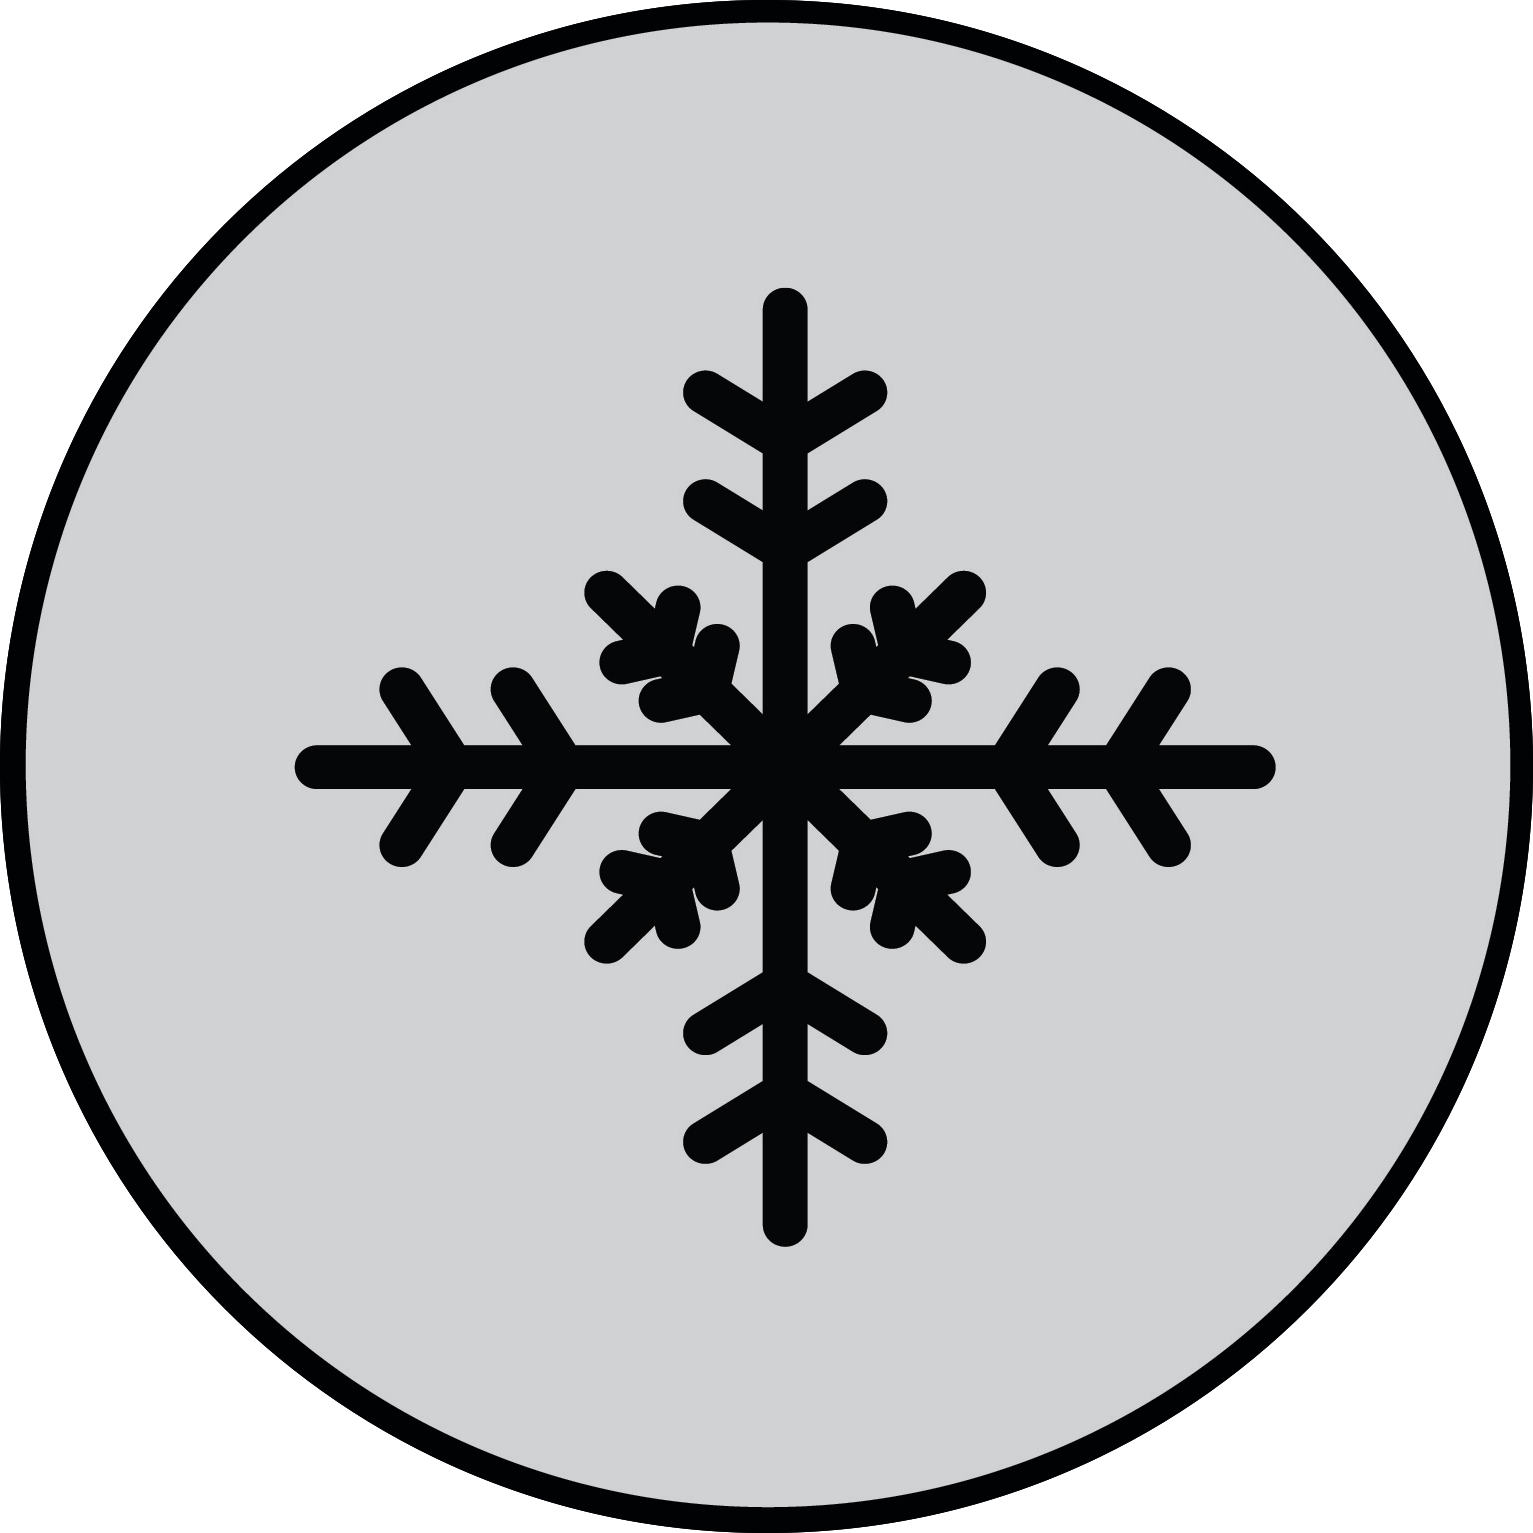 Holidays Circle Graphic